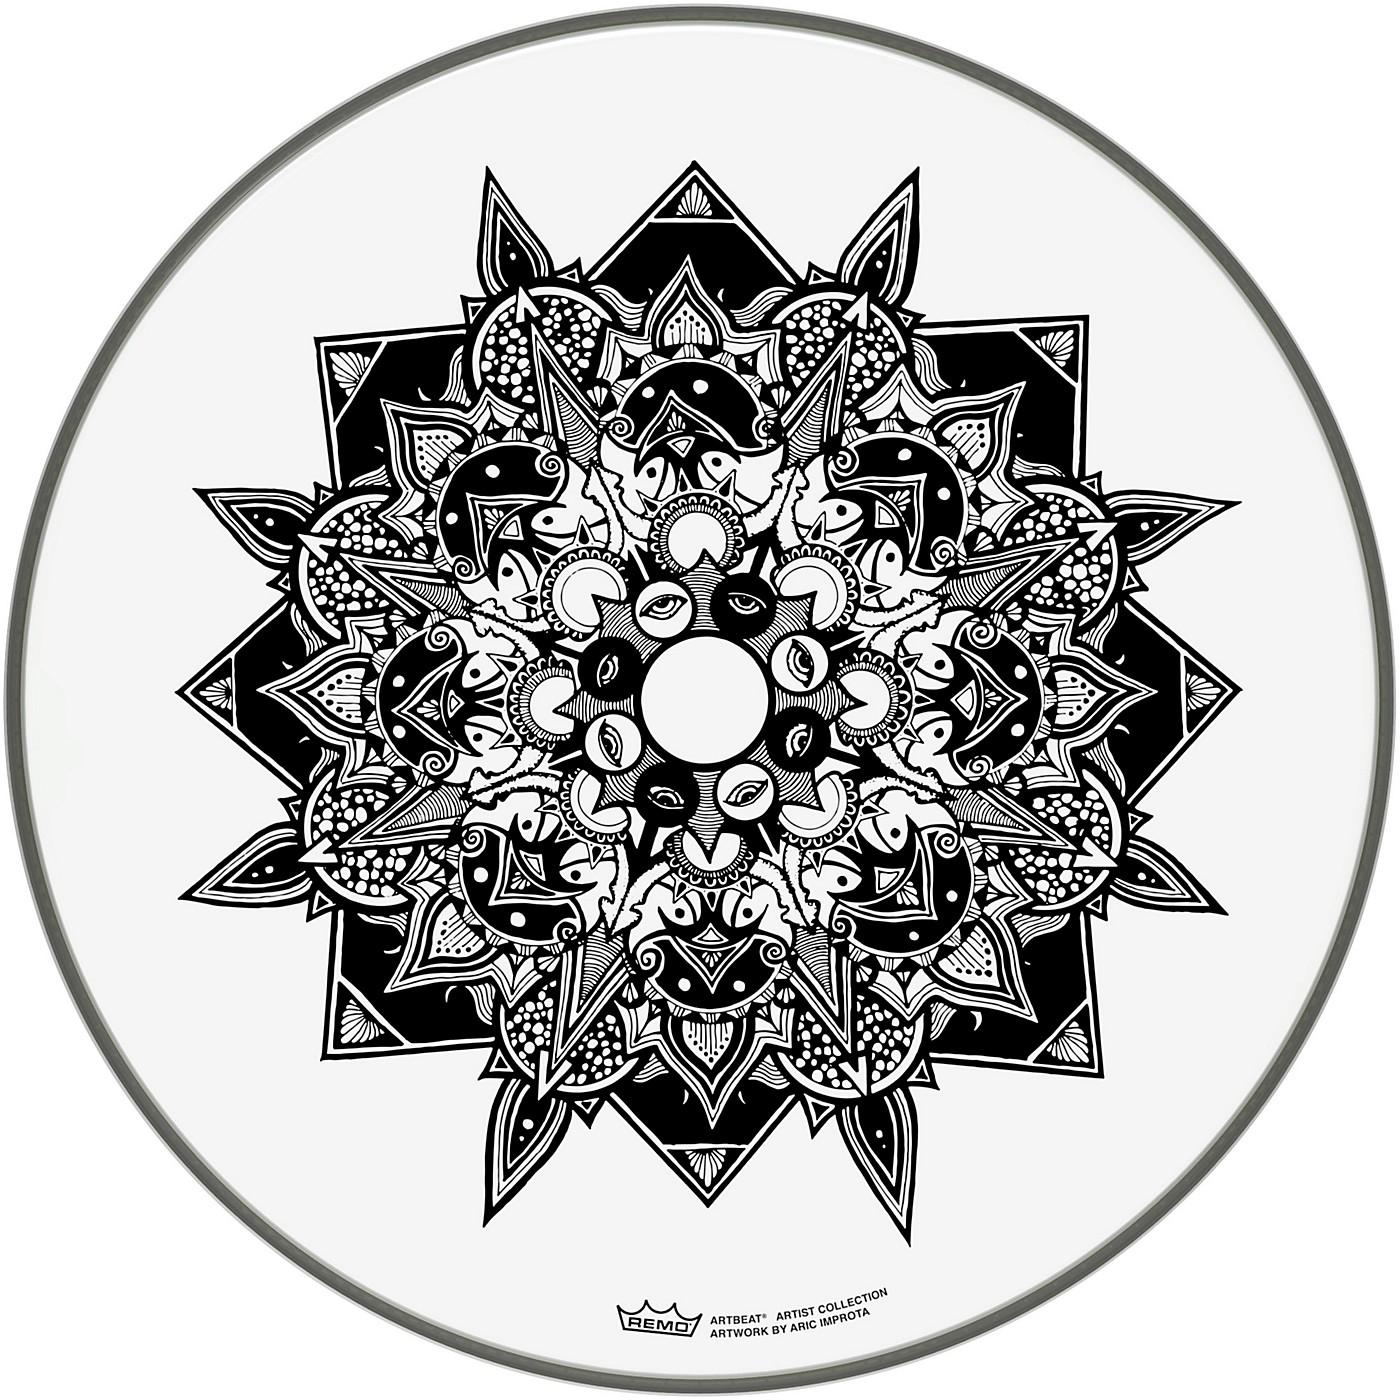 Remo ArtBEAT Aric Improta, Disillusion Artist Collection Drum Head, 16